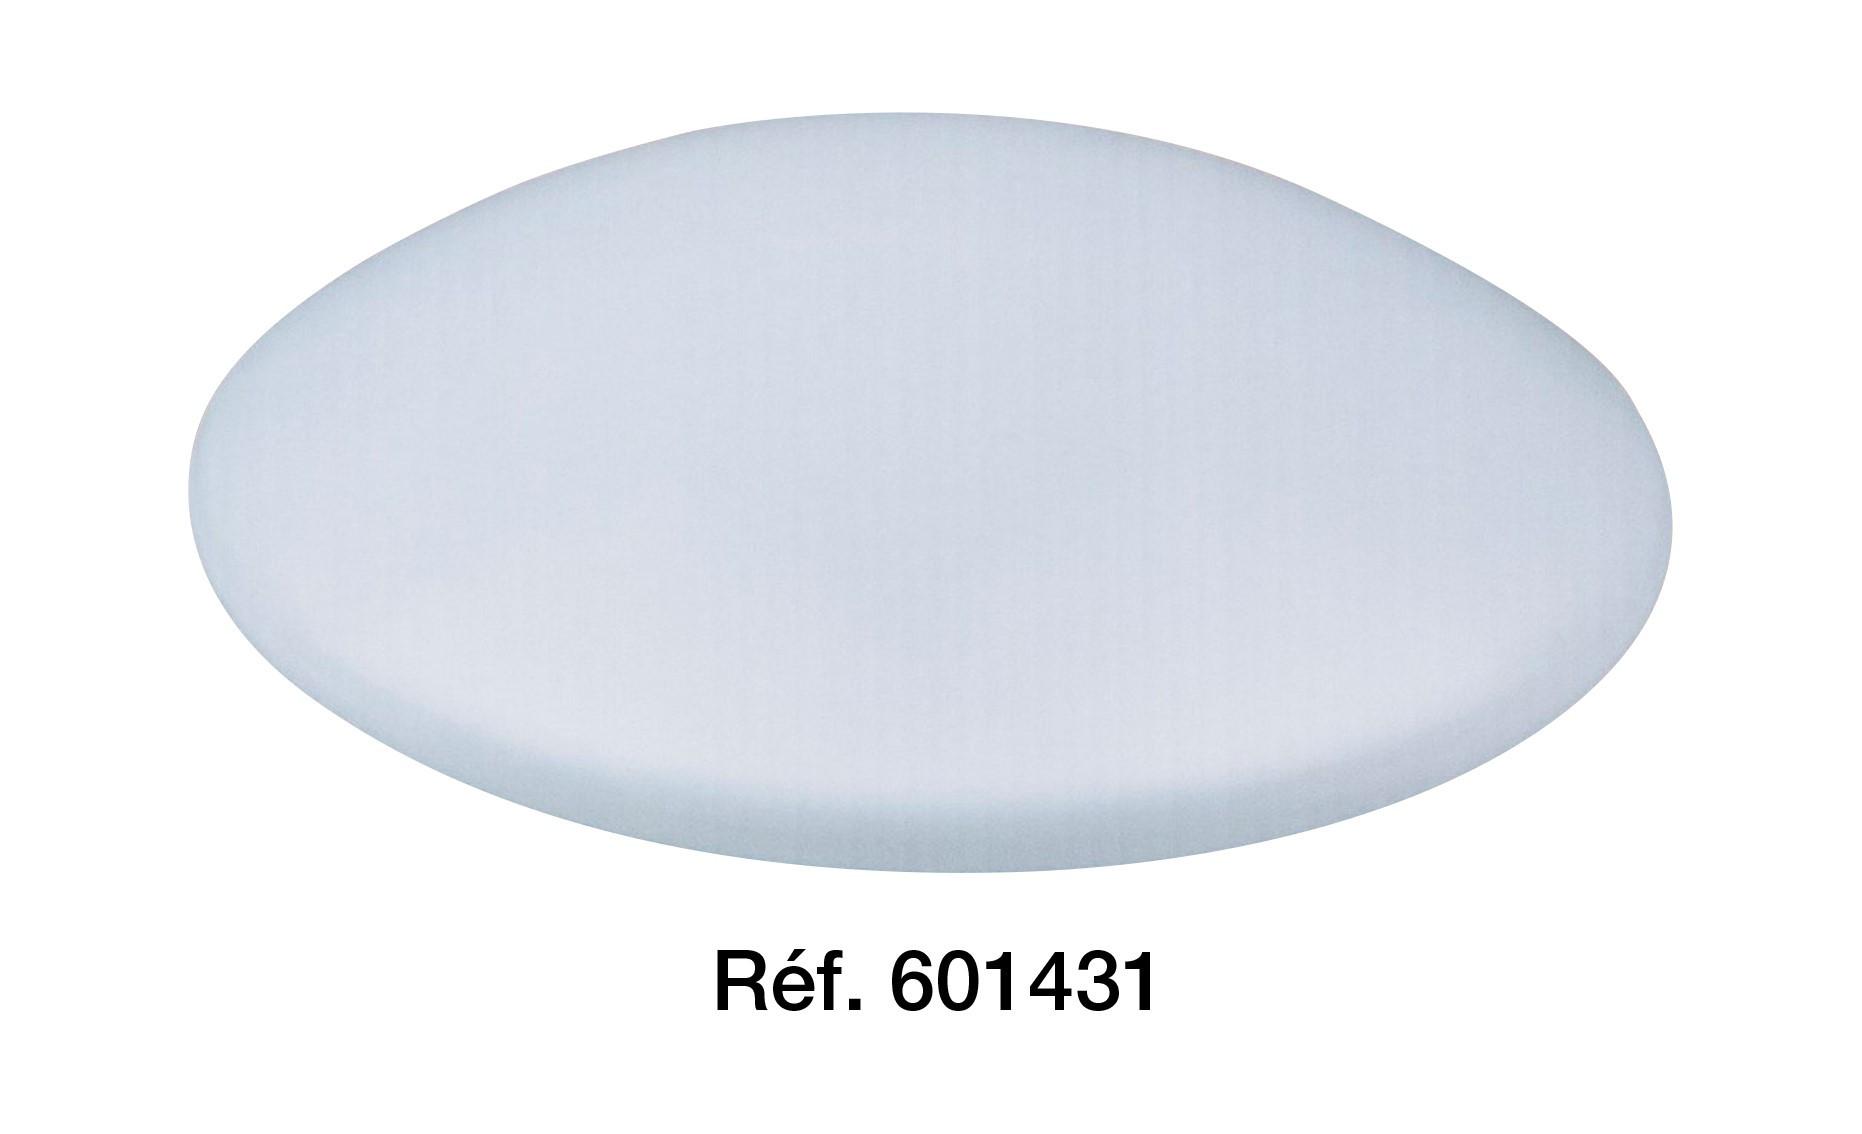 Plafonnier LED ECO 24W - 1700Lm - 4000K - IP44